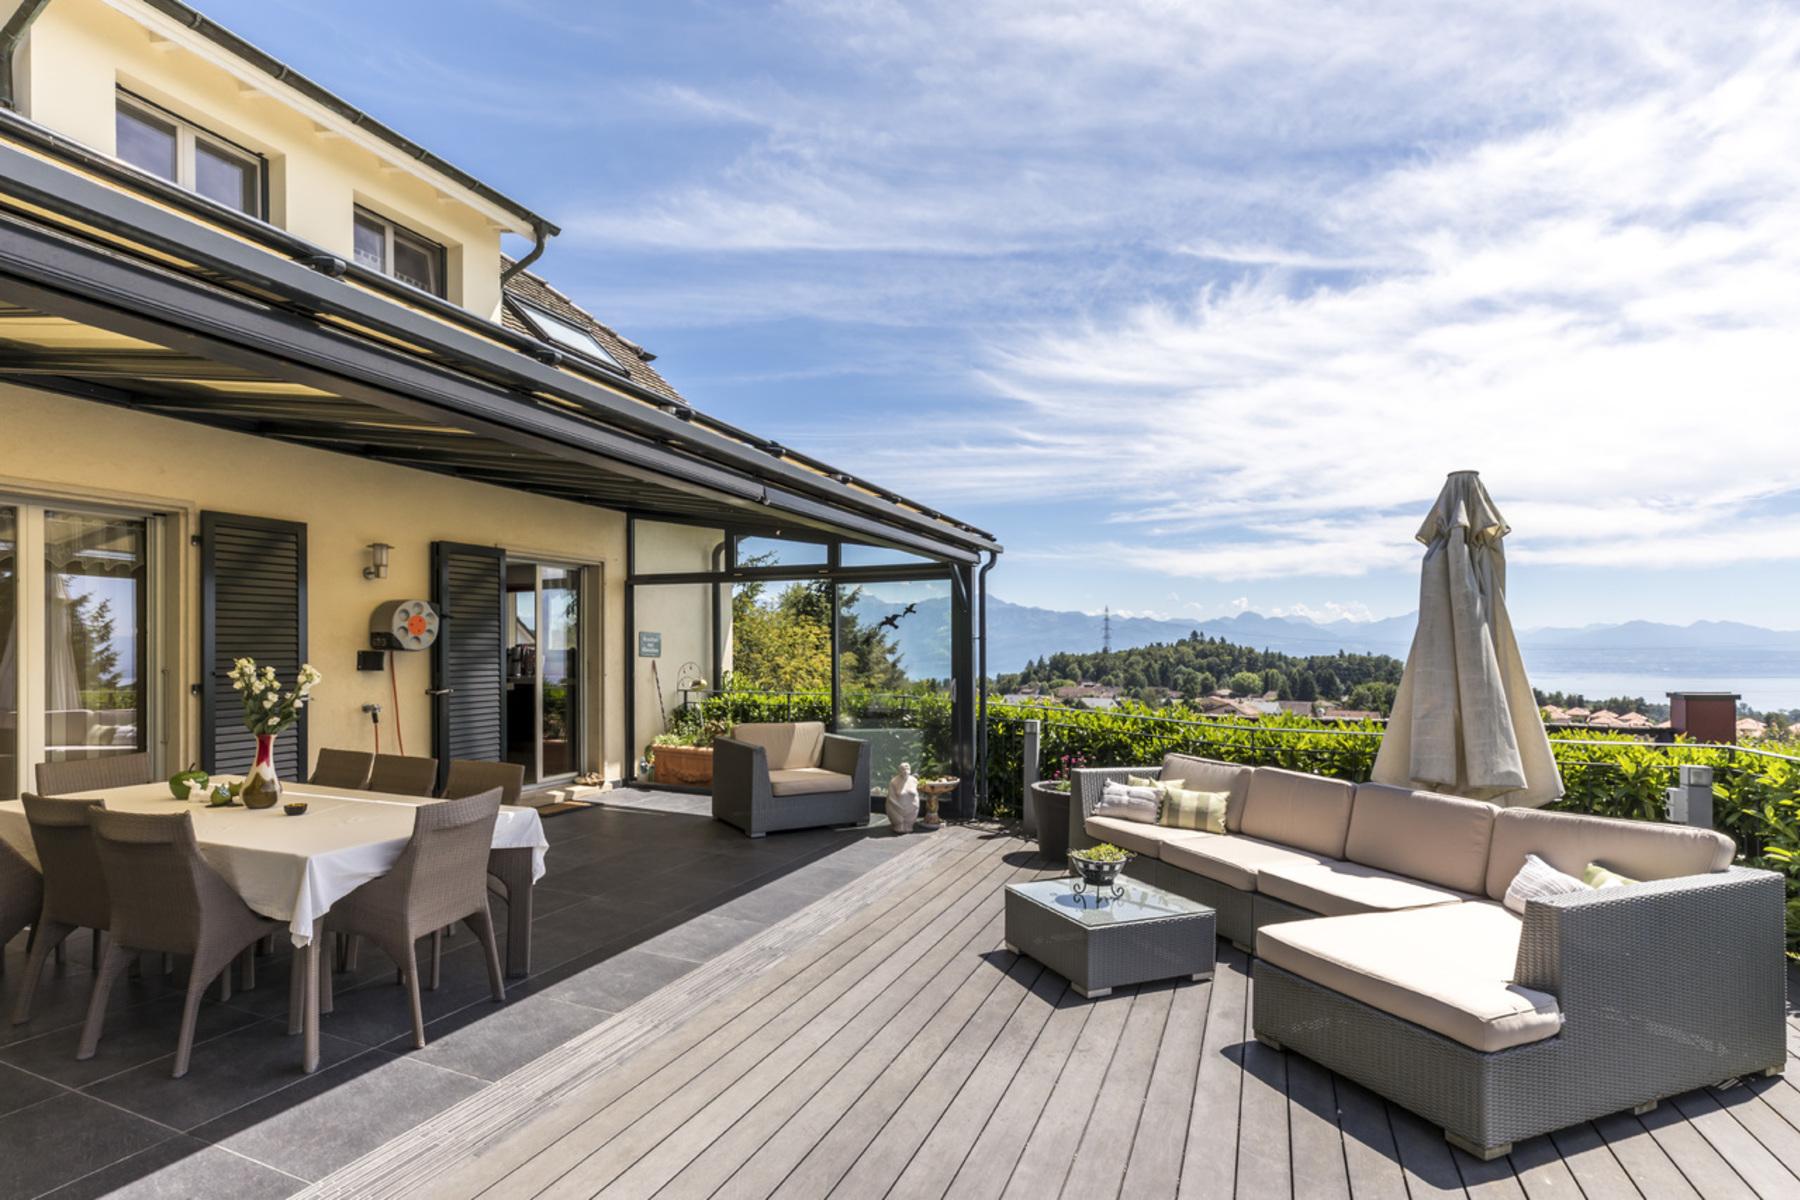 Maison unifamiliale pour l Vente à Beautiful, fully renovated property with view over the lake Epalinges Epalinges, Vaud, 1066 Suisse